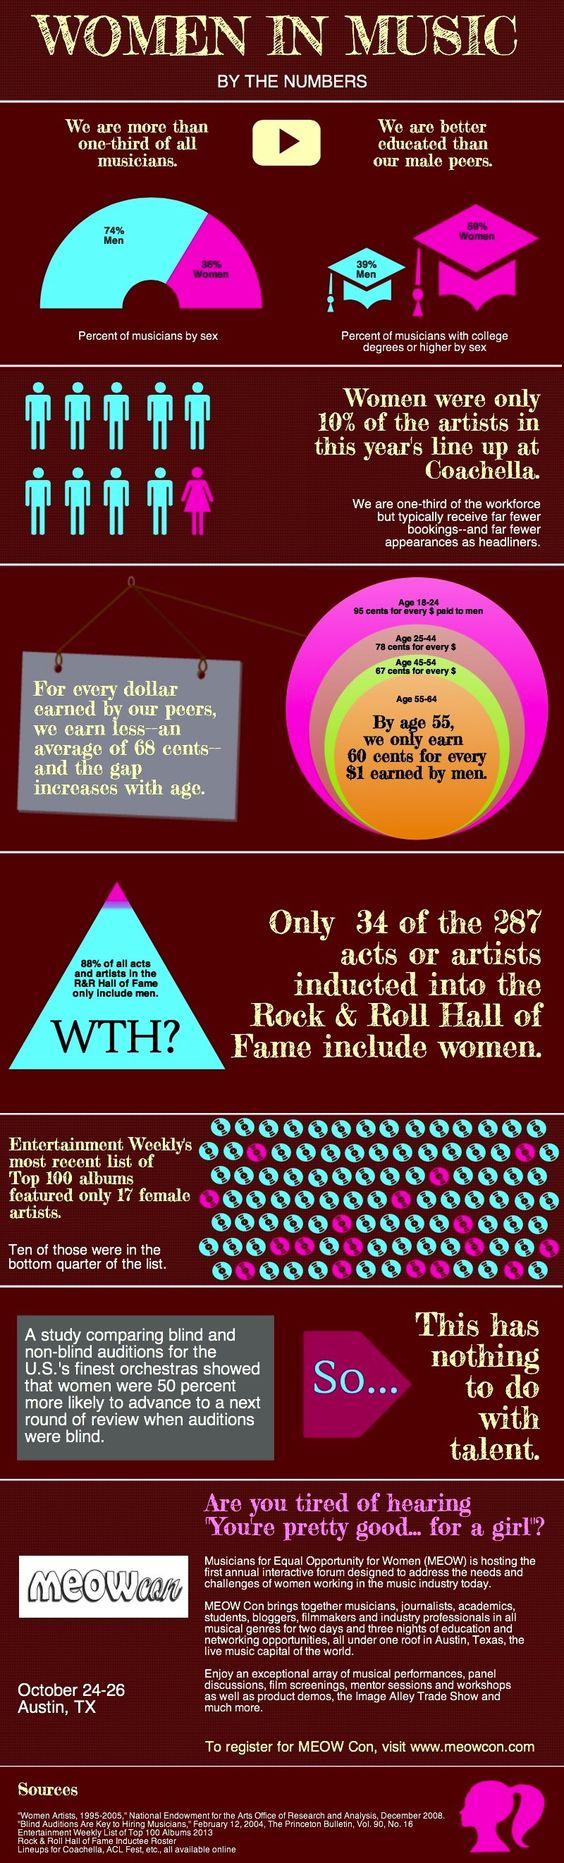 Women In Music Infographic